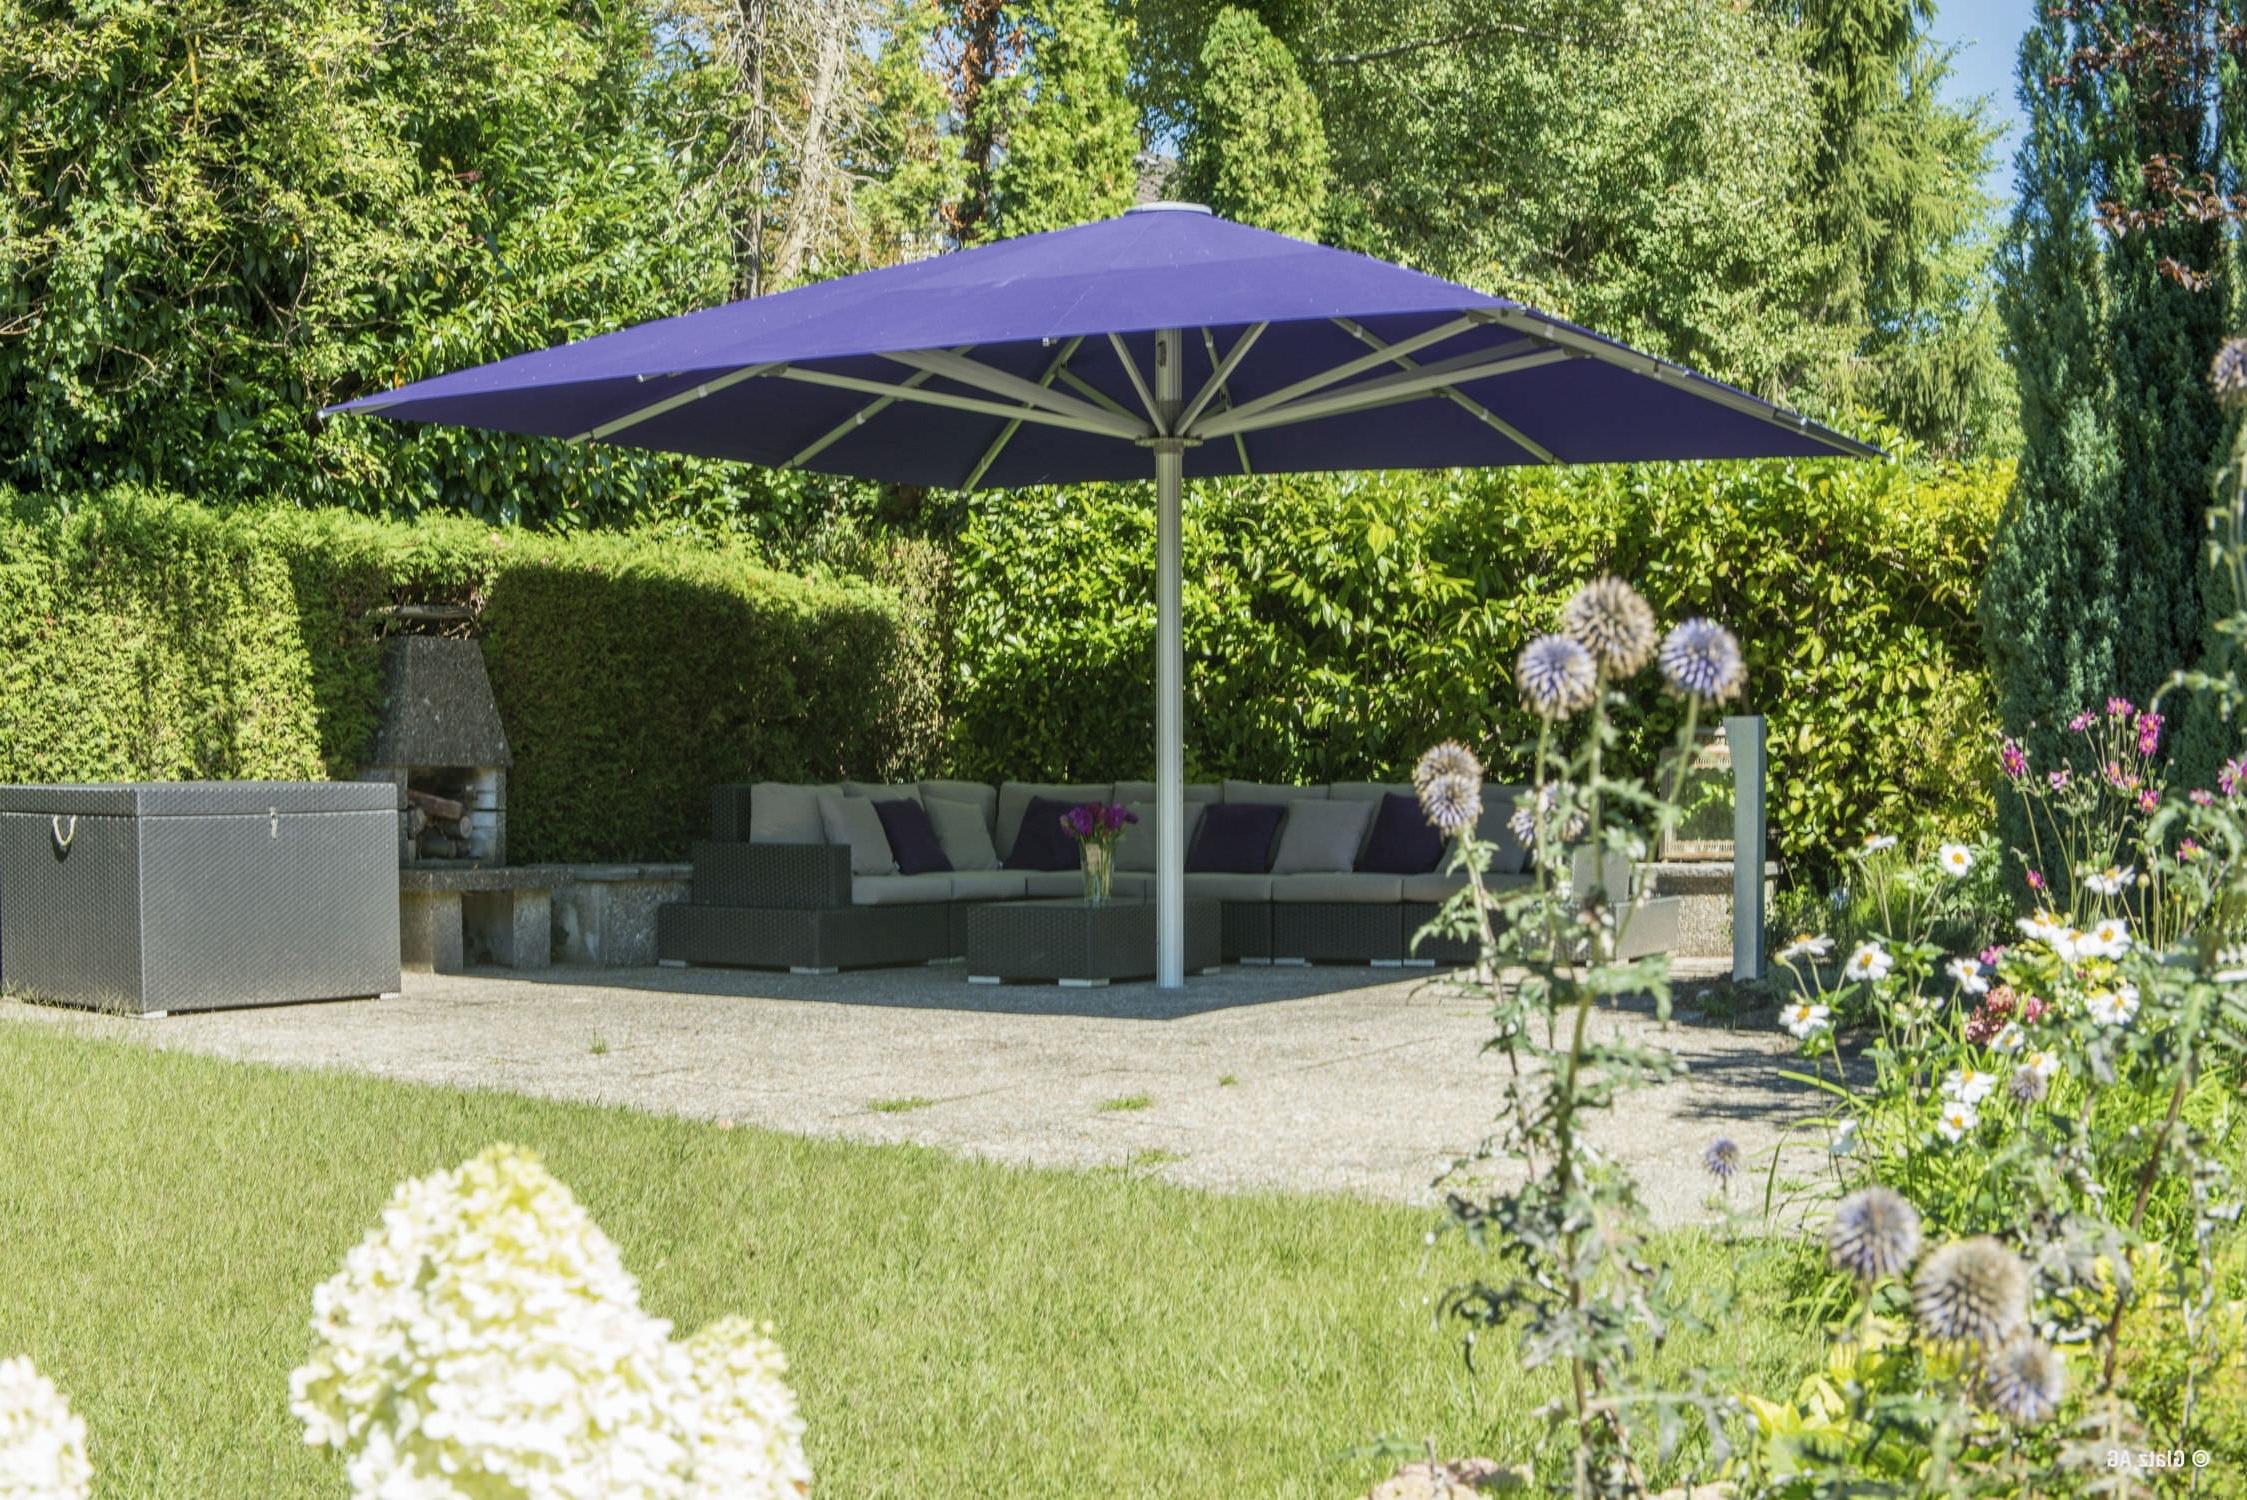 Wind Resistant Patio Umbrellas With Regard To Most Popular High Wind Patio Umbrellas • Patio Ideas (View 20 of 20)